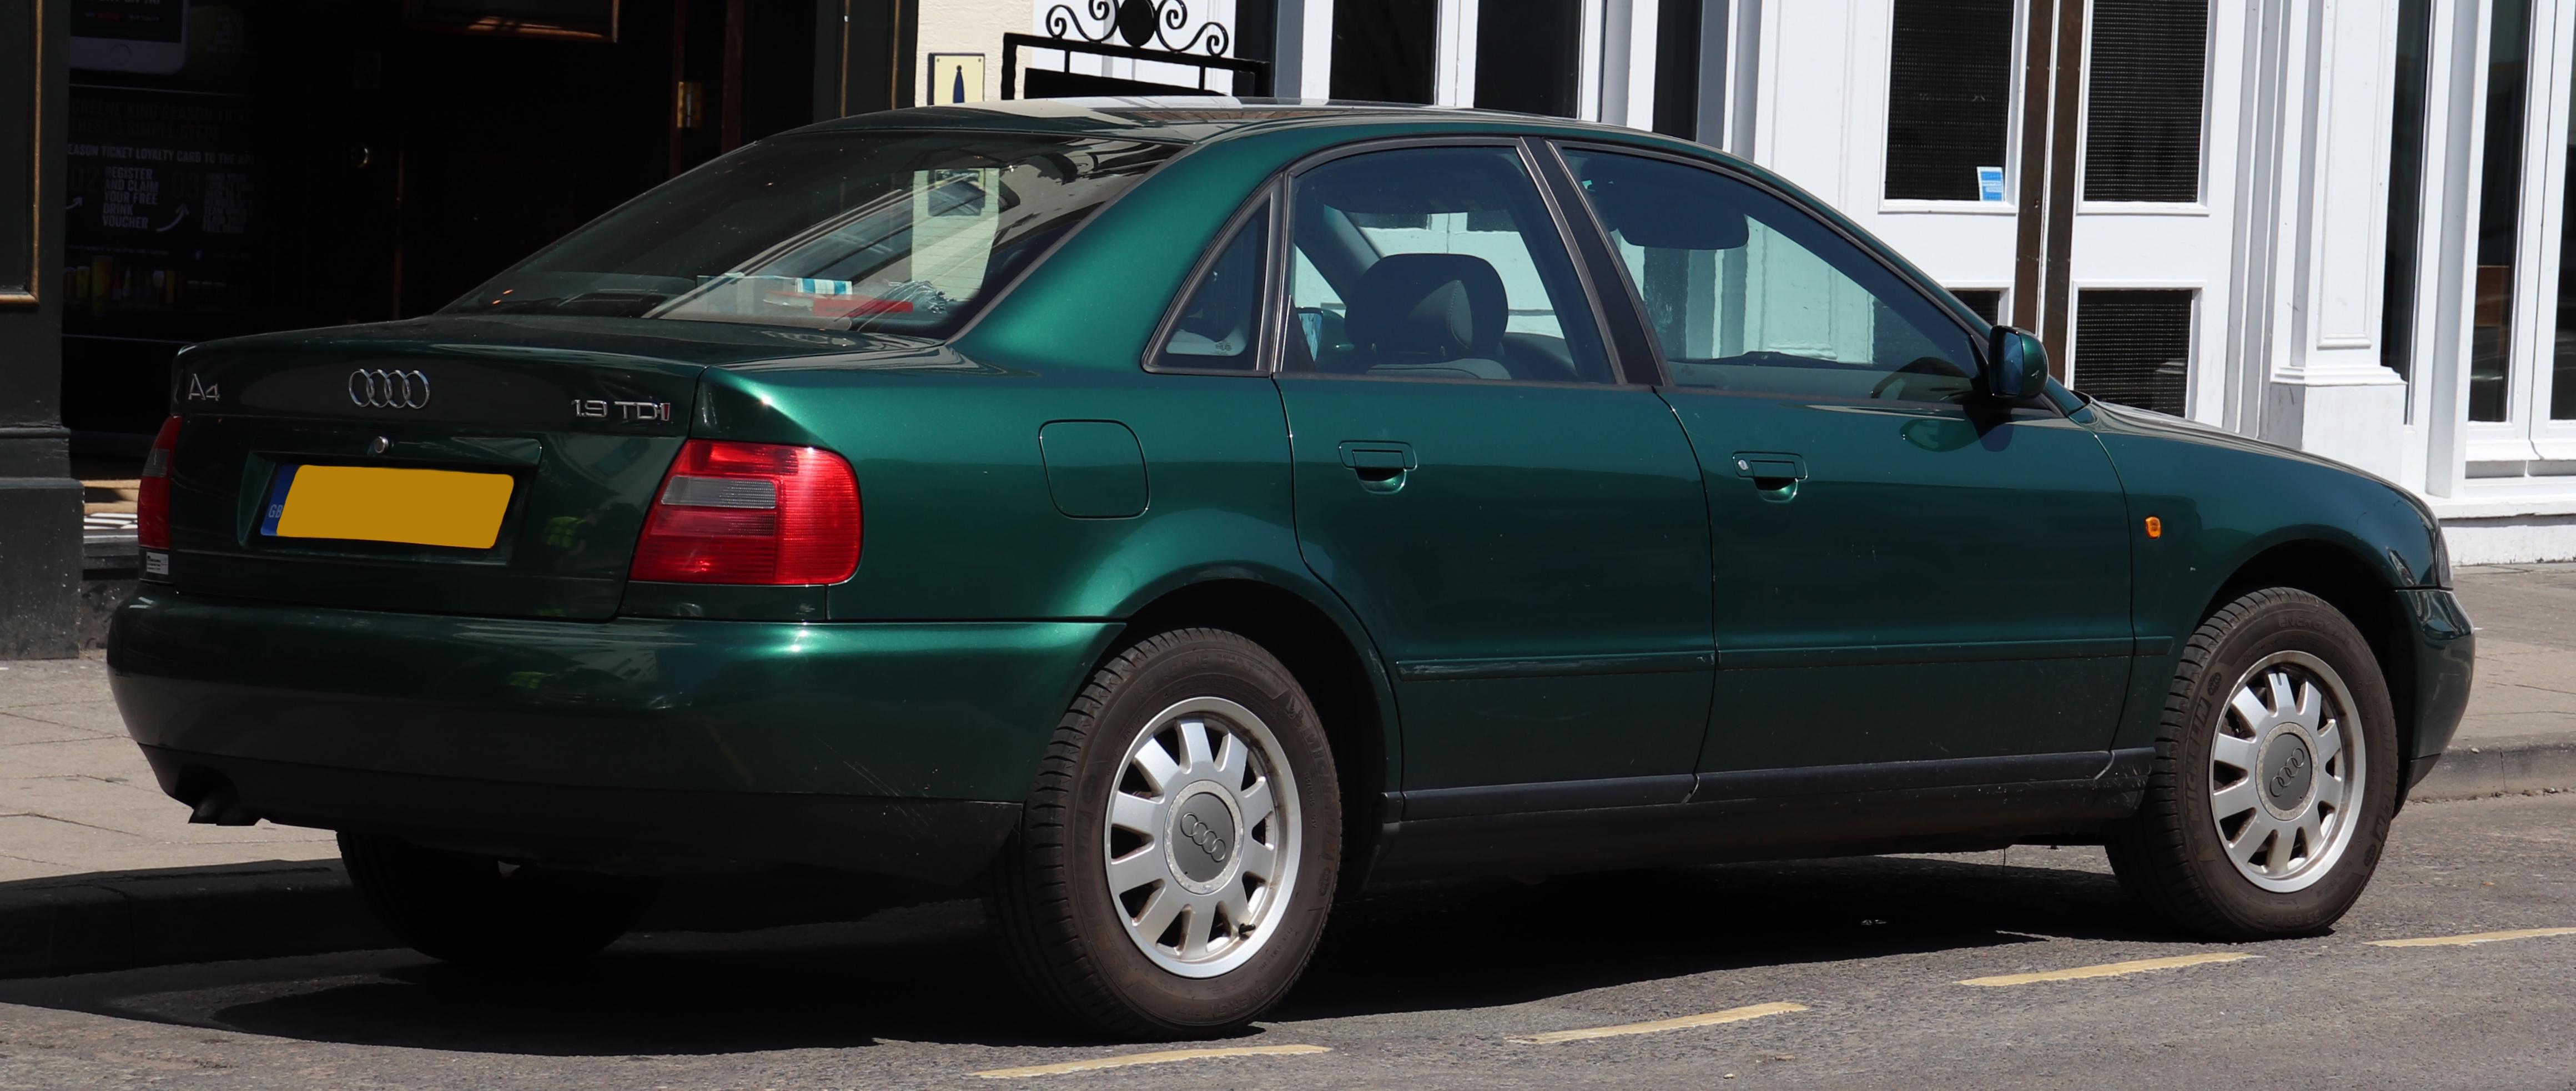 Kekurangan Audi A4 1998 Tangguh